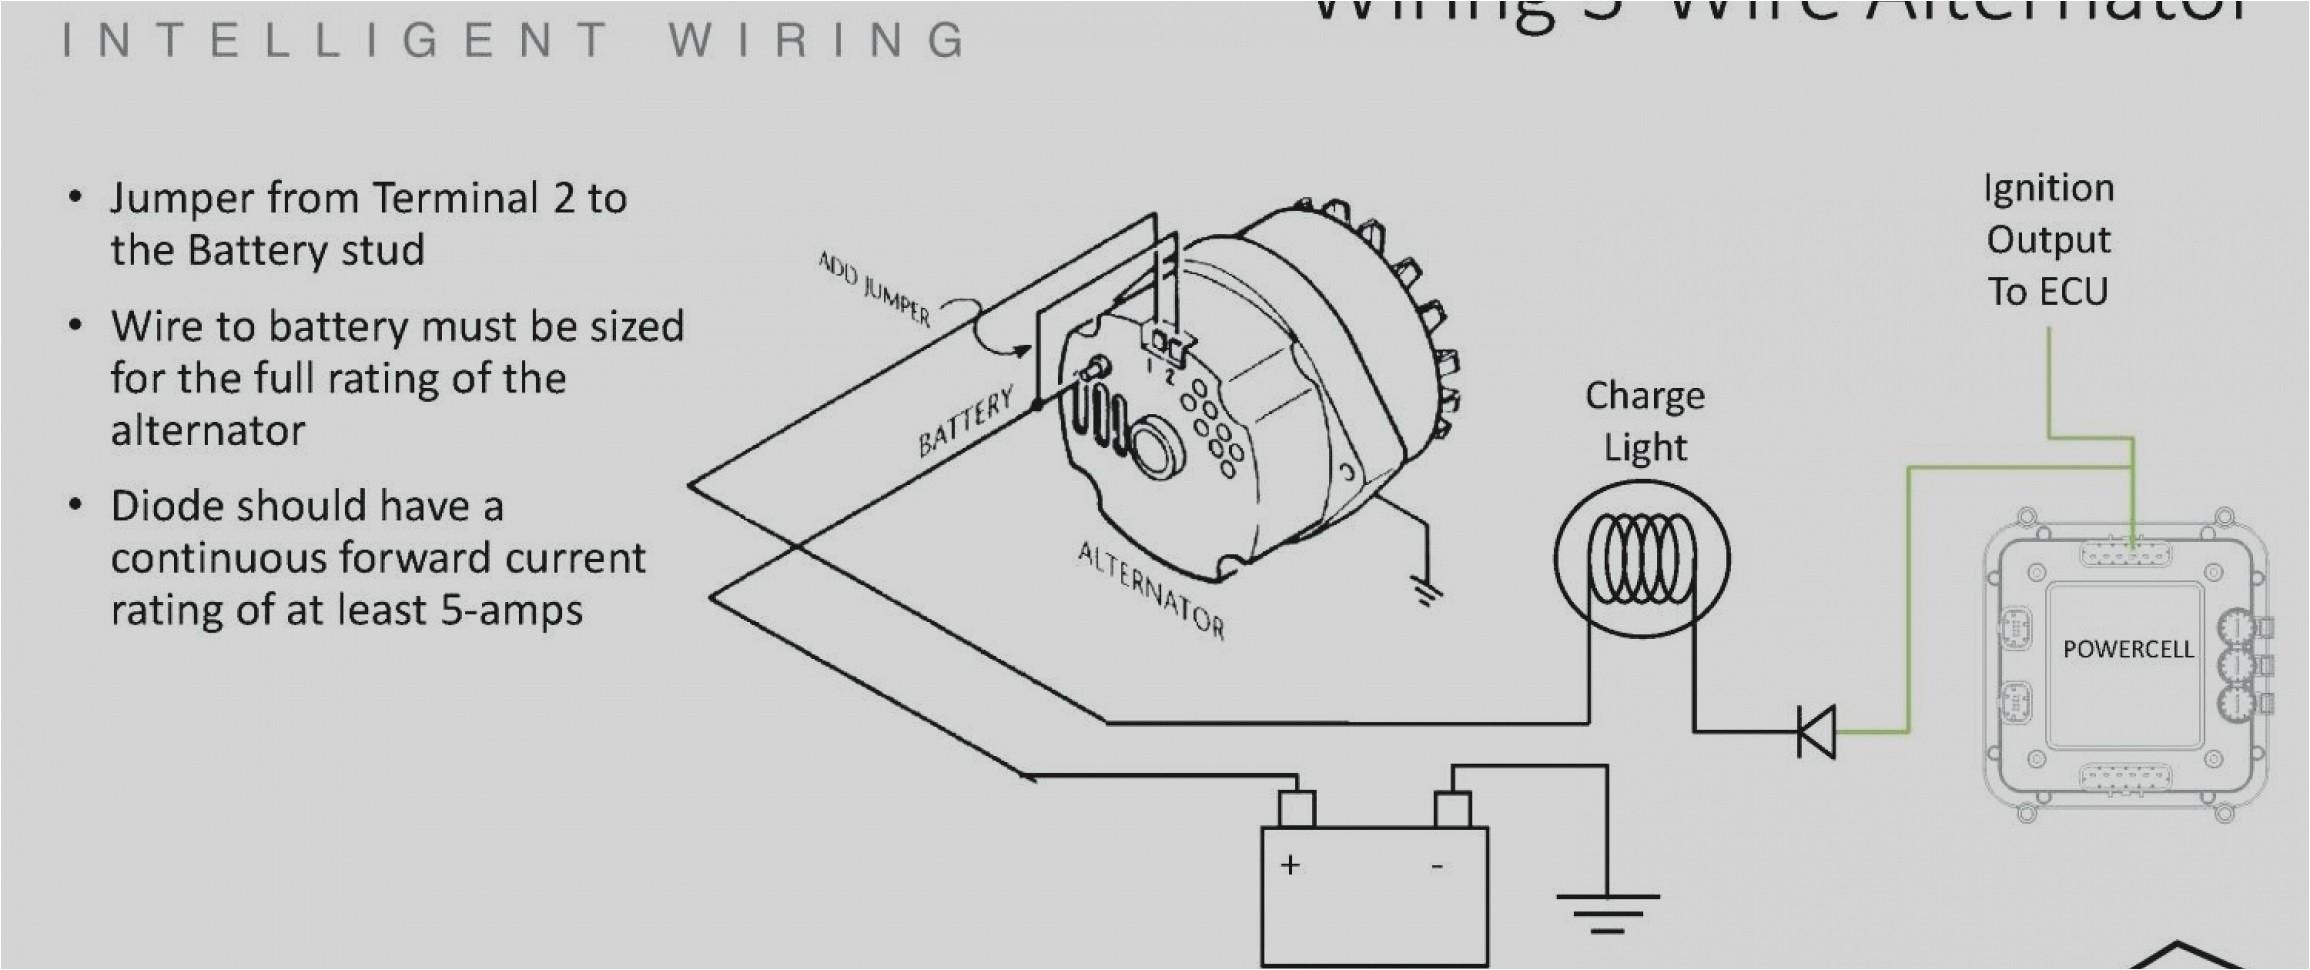 gm alternator wiring diagram internal regulator luxury alternator wiring diagram chevy 350 amp wiring diagram moreover gm 1 of gm alternator wiring diagram internal regulator 17 chevy 350 alternator jpg